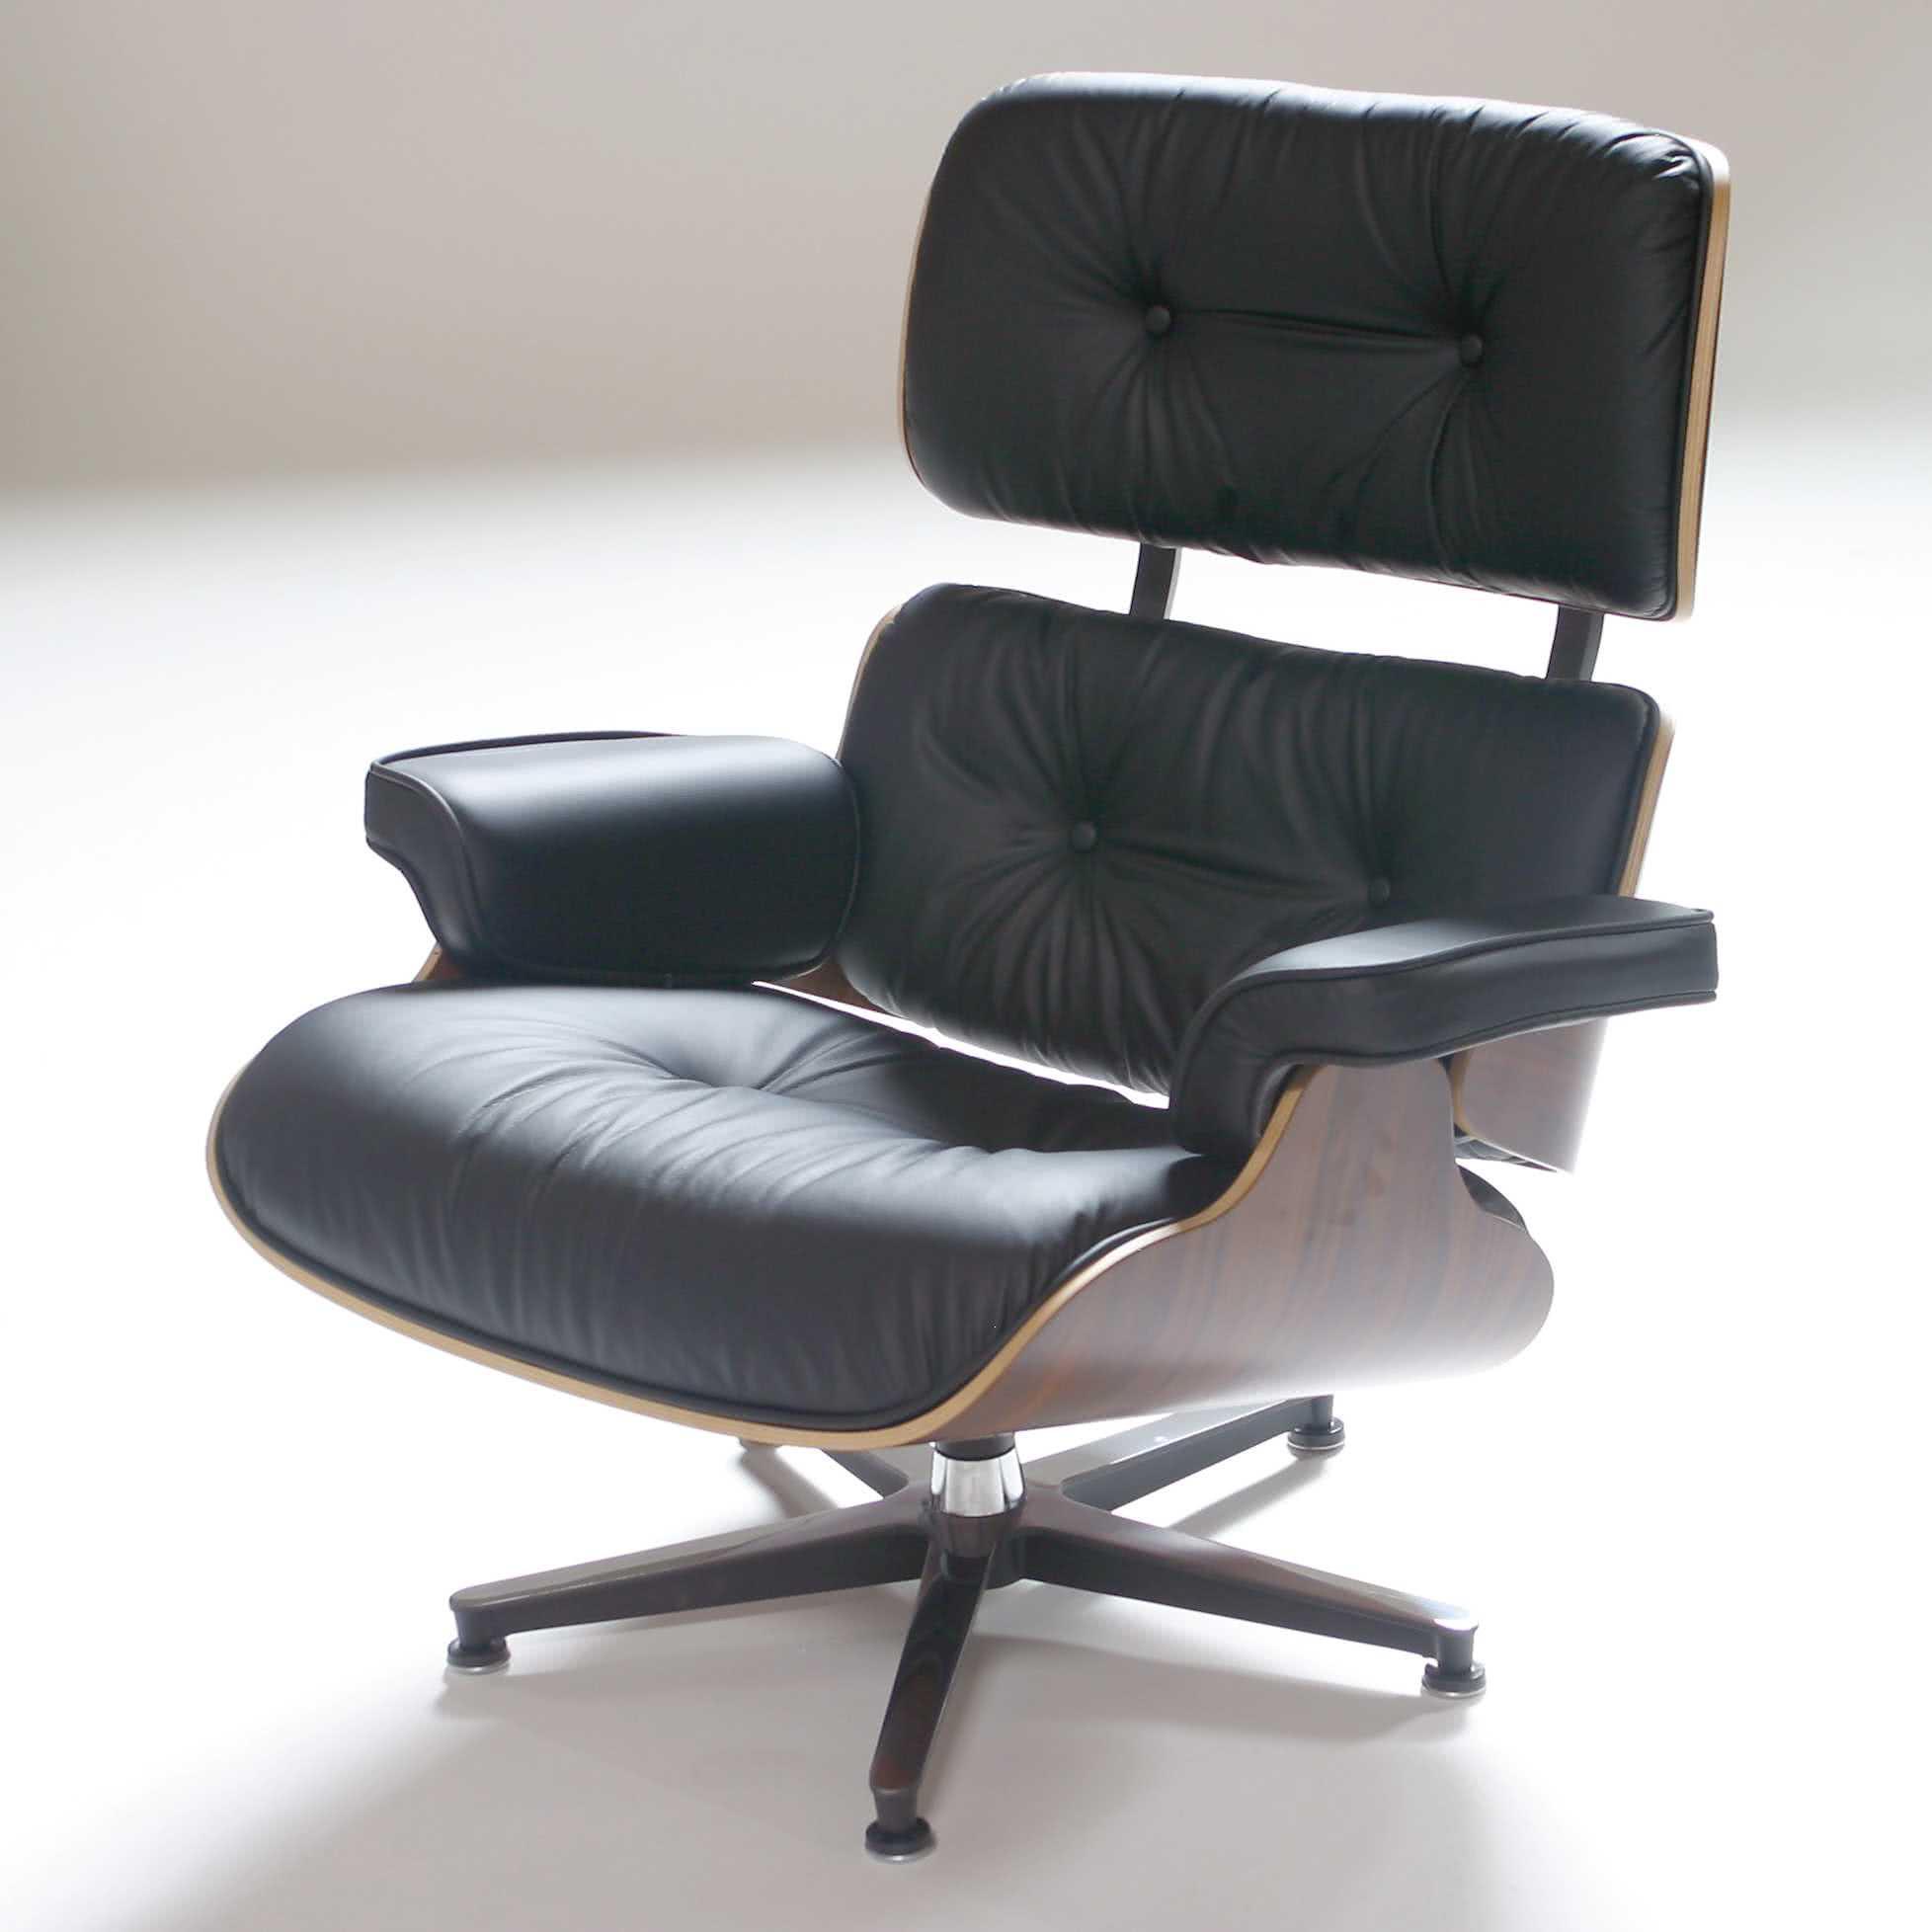 Designer Sessel Eames